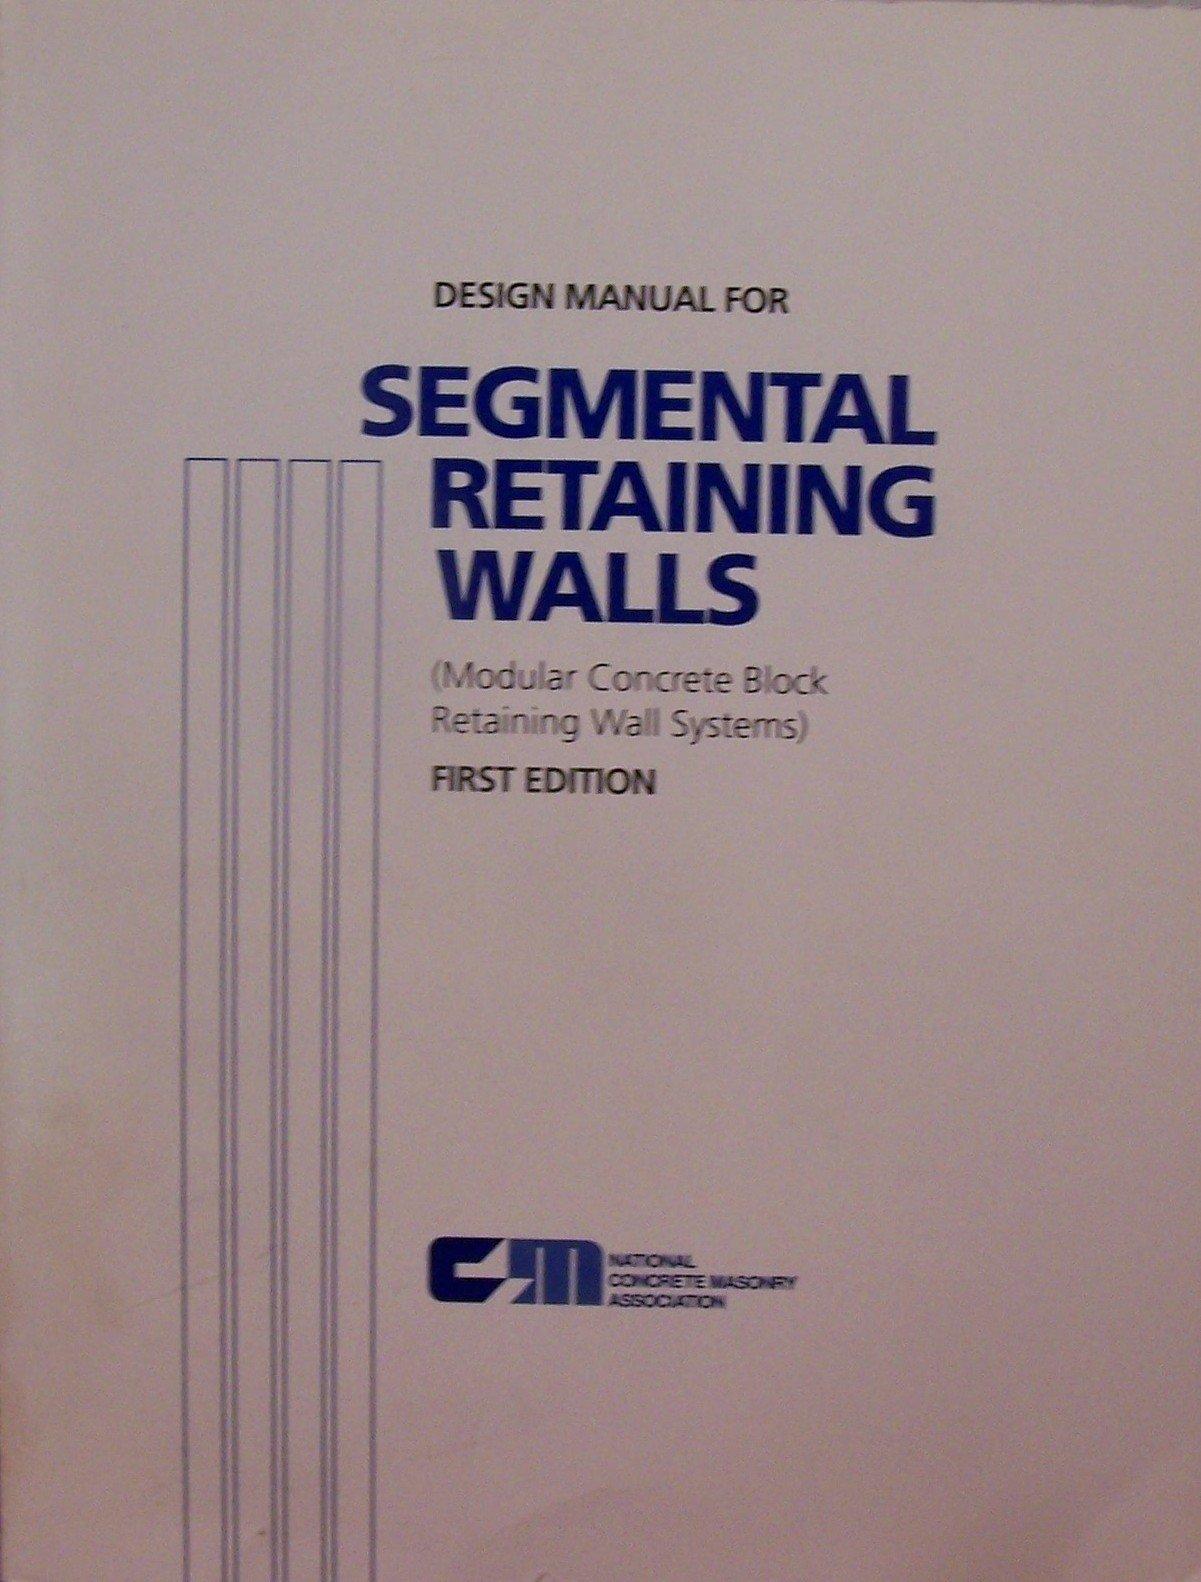 Design Manual For Segmental Retaining Walls: Modular Concrete Block  Retaining Wall Systems (NCMA Publication): Michael R Simac: 9781881384014:  Amazon.com: ...